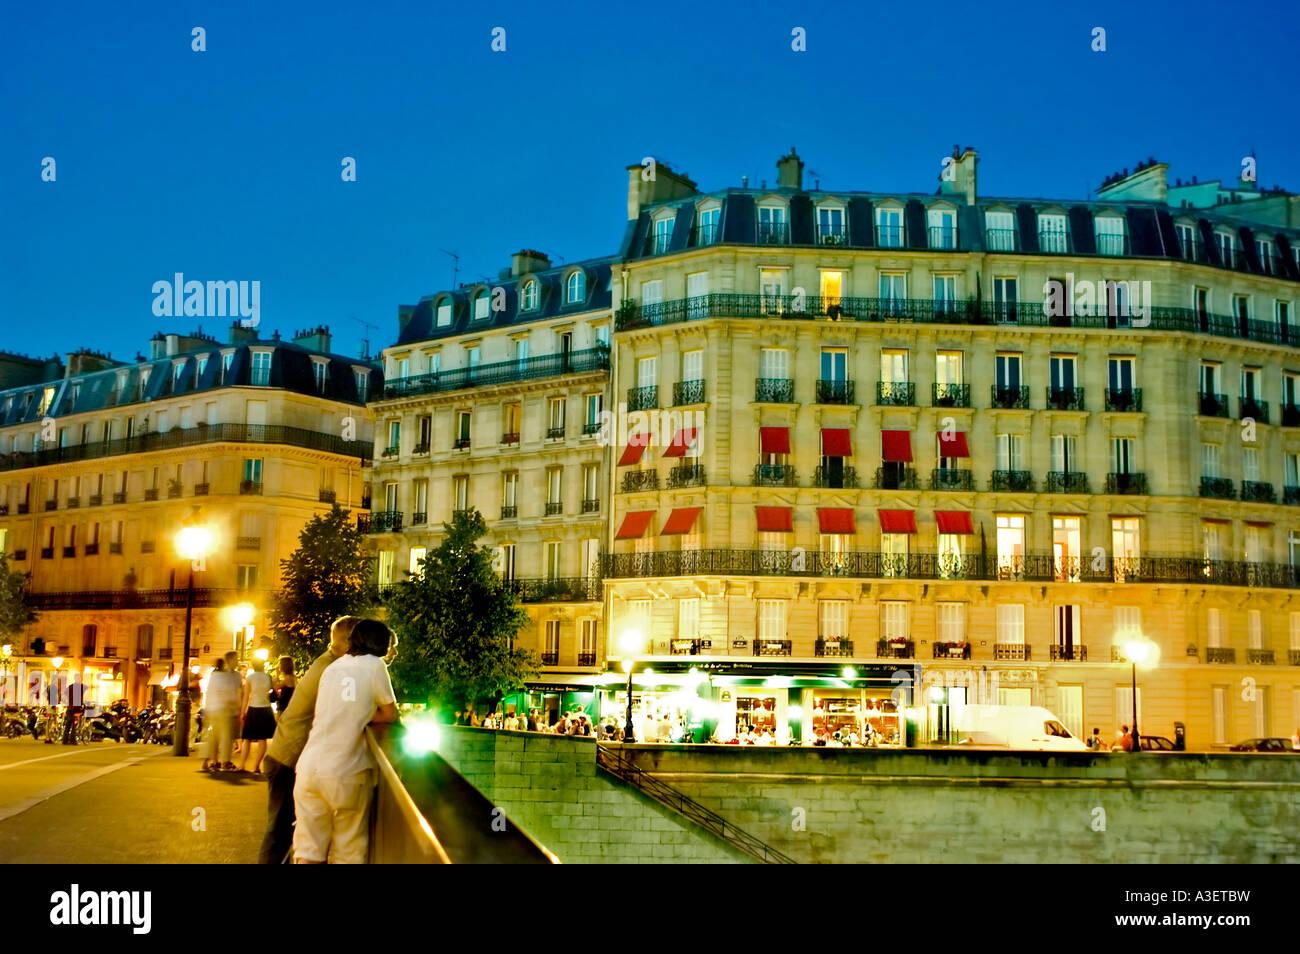 Paris France, Young Adults hanging Around on the Bridge 'Pont St Louis' 'Ile Saint Louis' On 'Seine - Stock Image